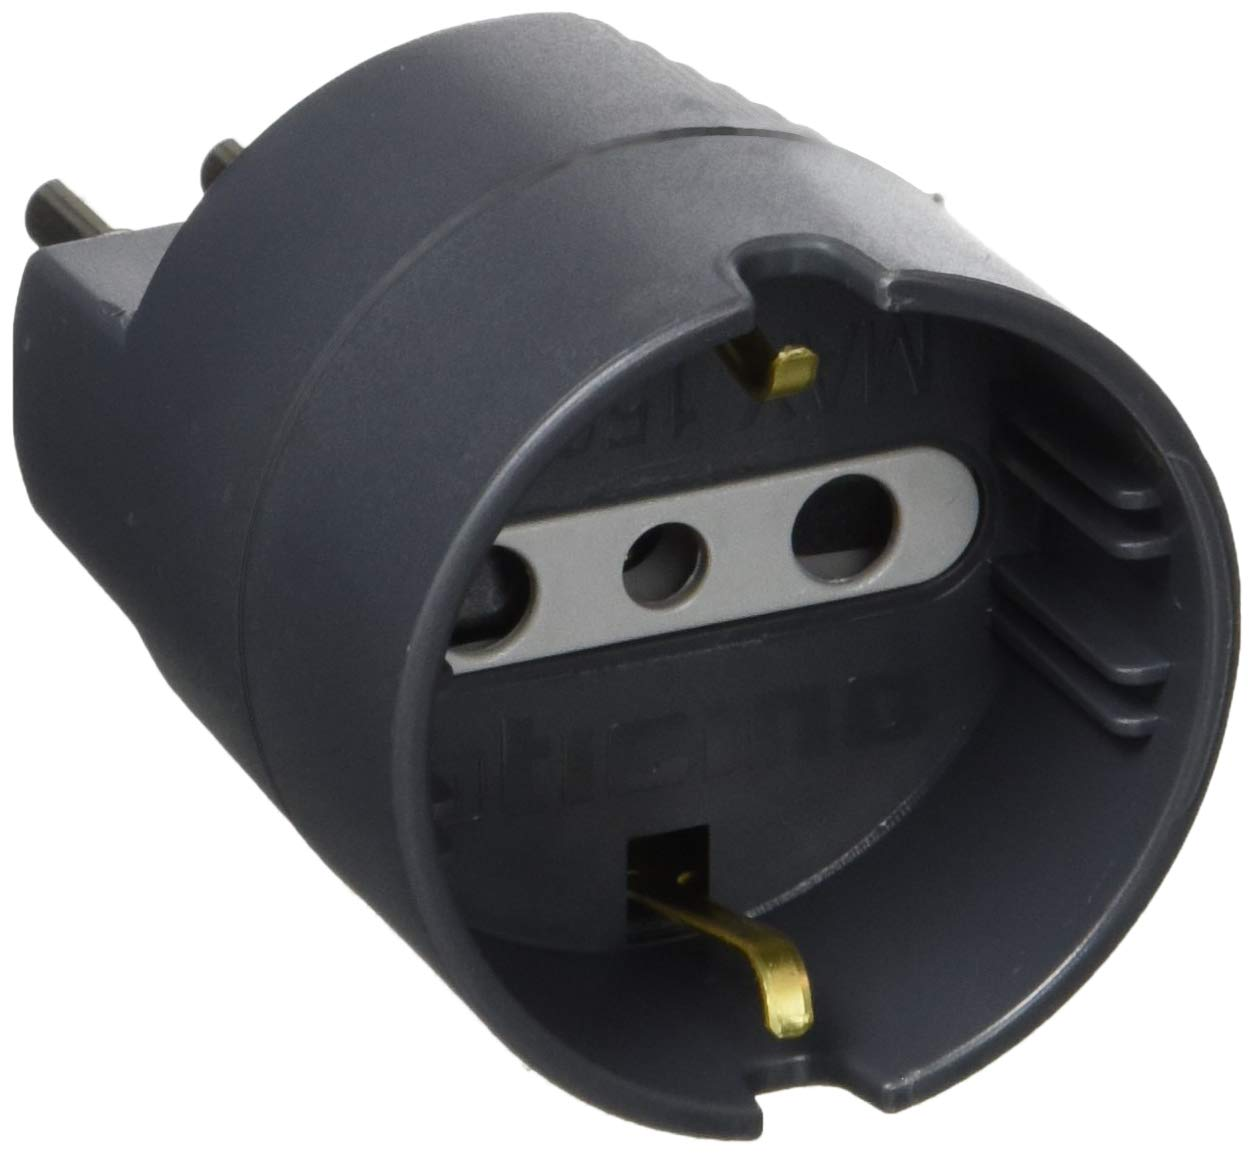 BTicino-S3623GEBK-Adattatore-Spina-10A-Presa-P30-Nero